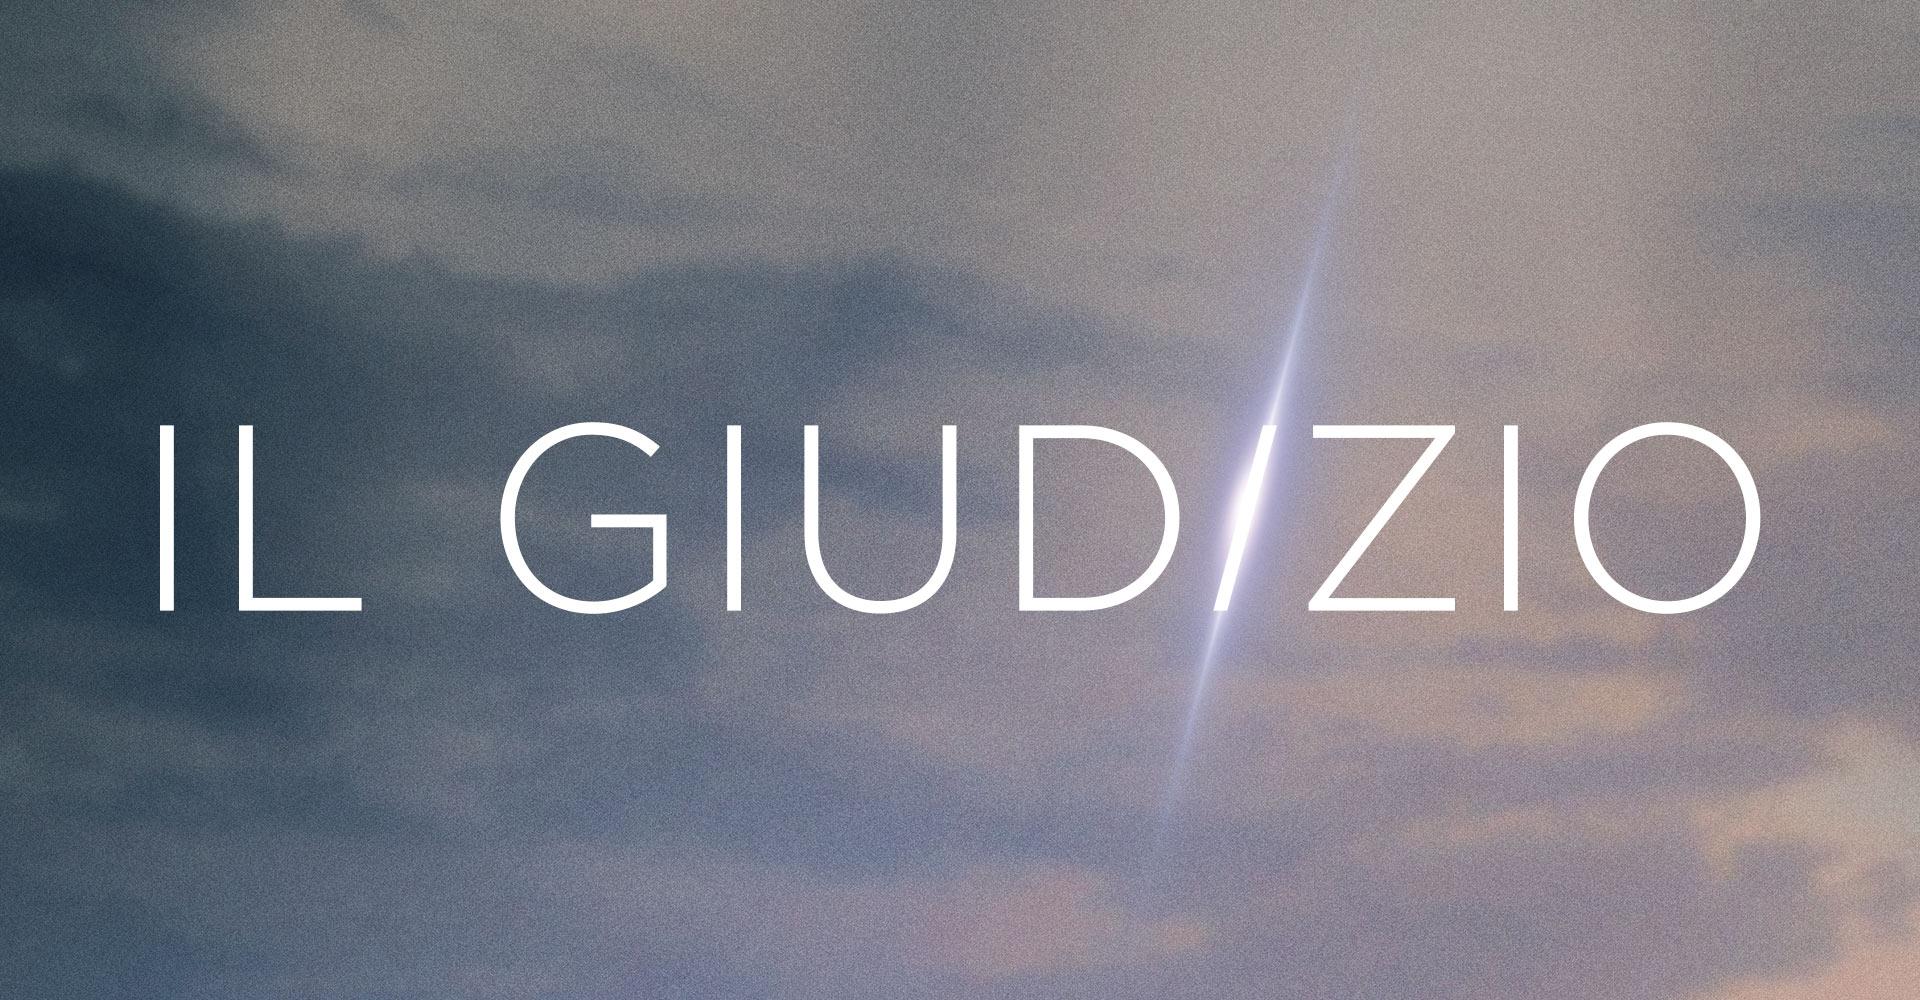 IlGiudizio_Behance_05